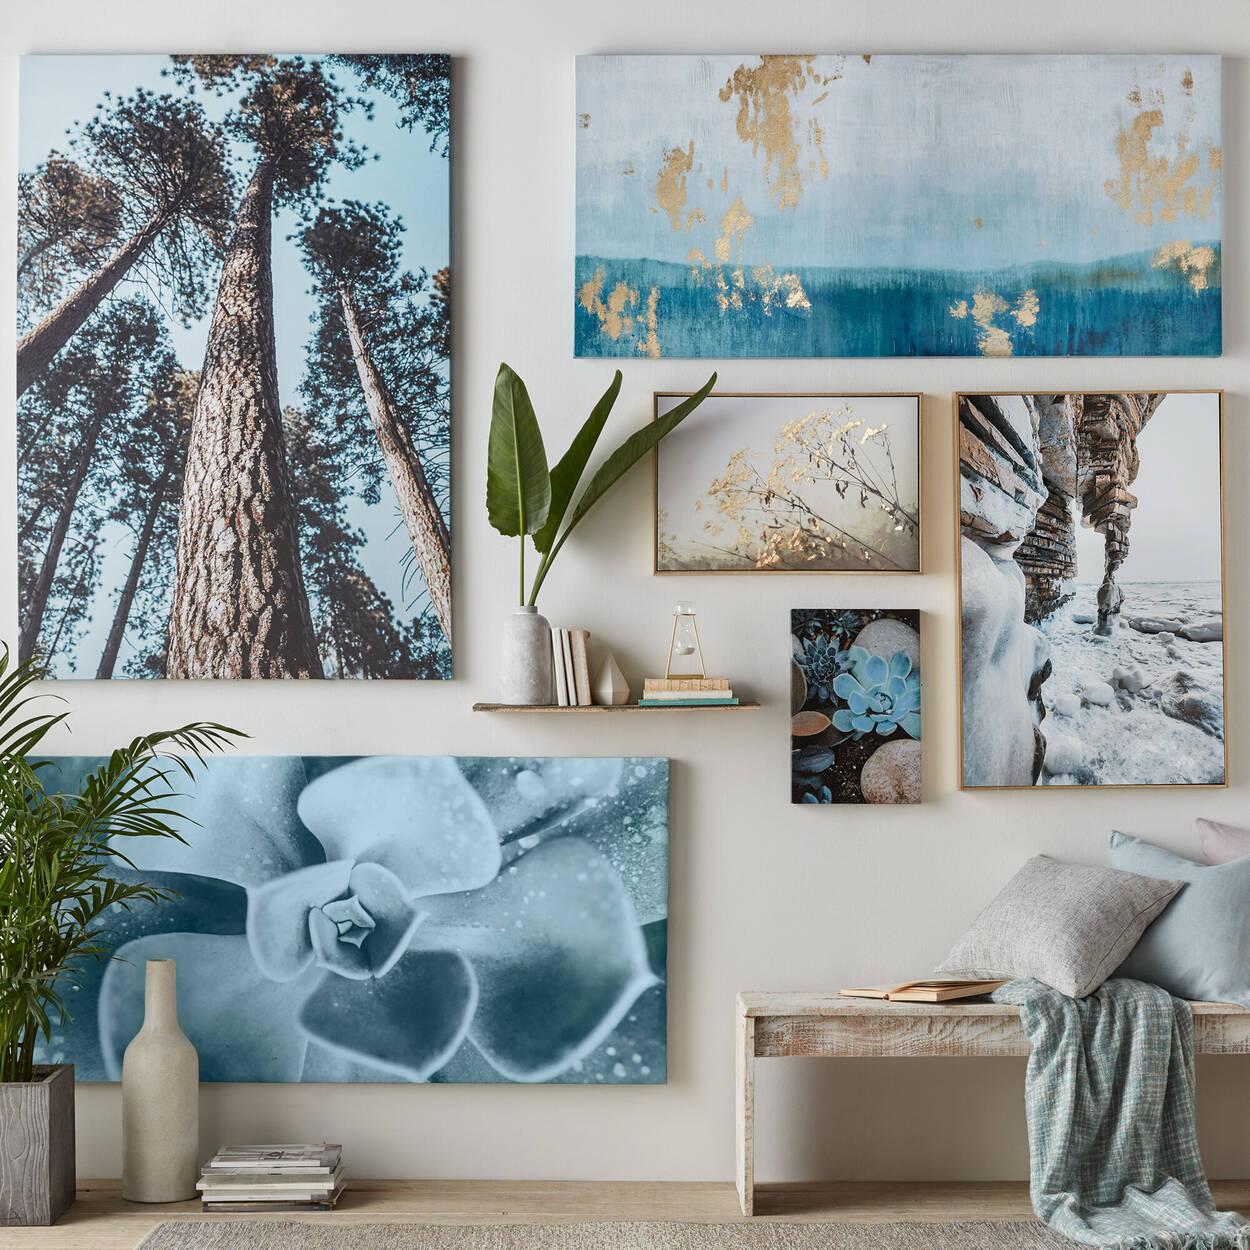 Foil-Embellished Framed Abstract Printed Canvas